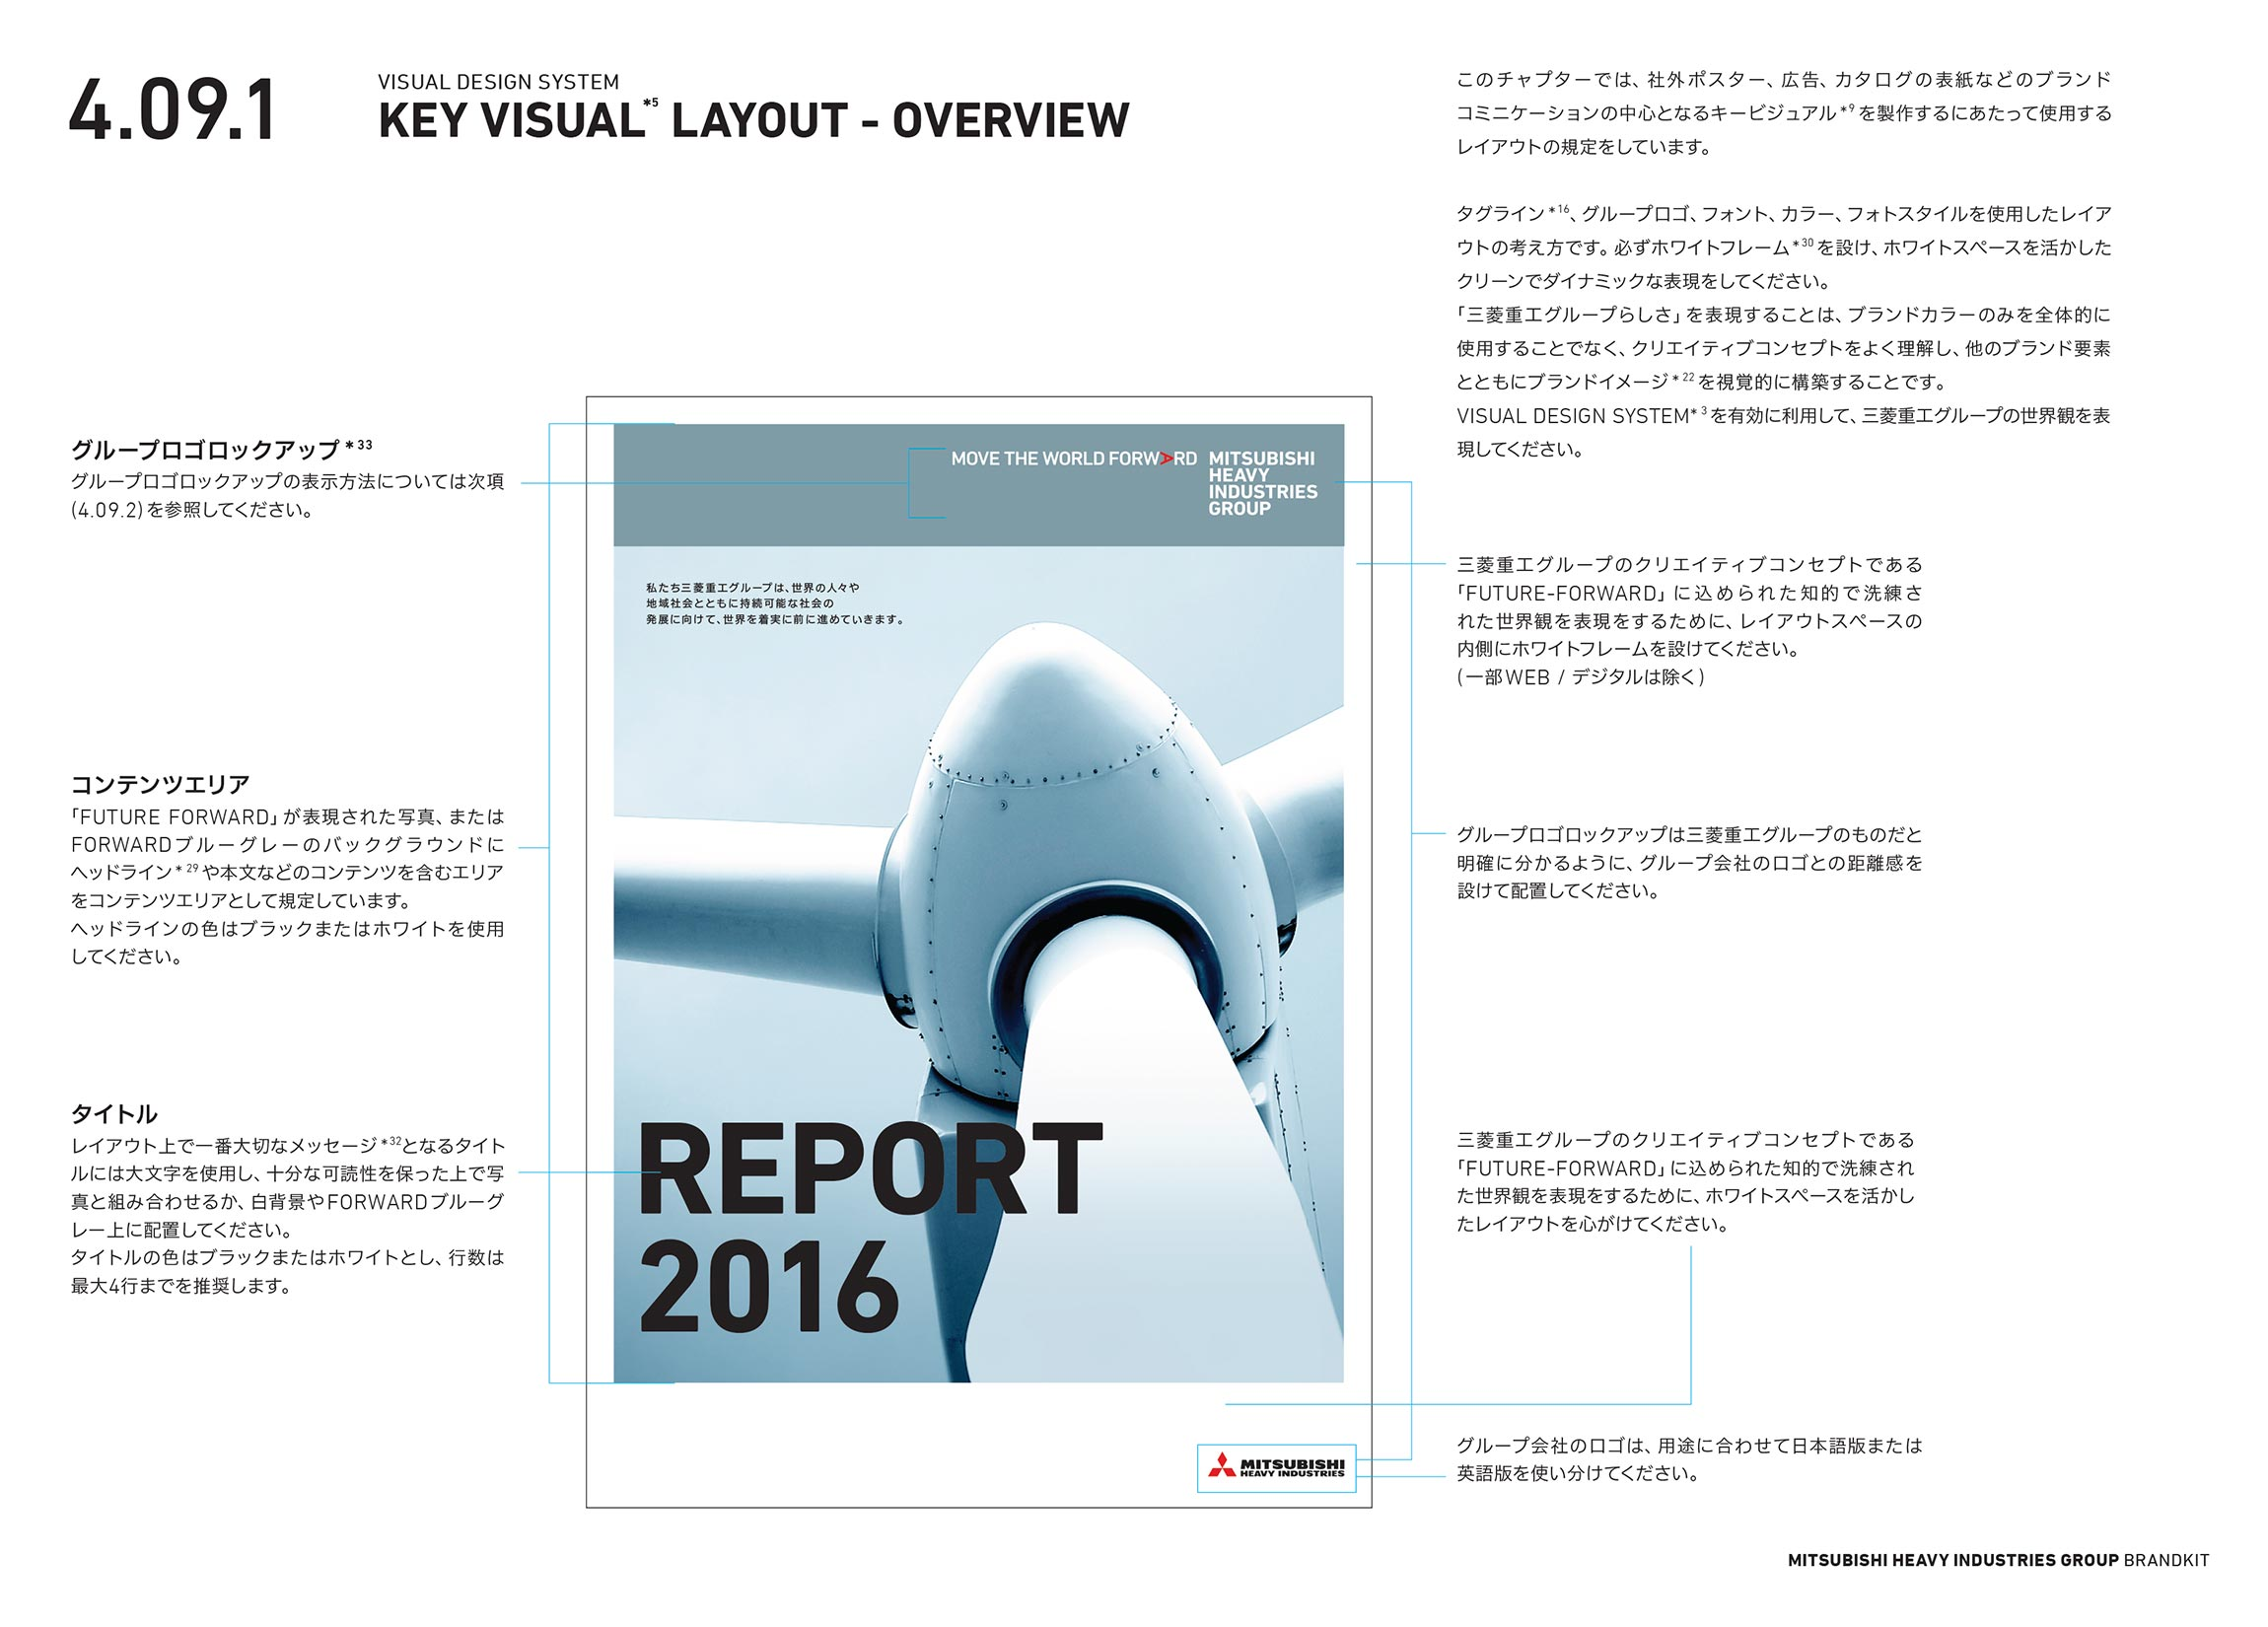 Mitsubishi Group key visual layout